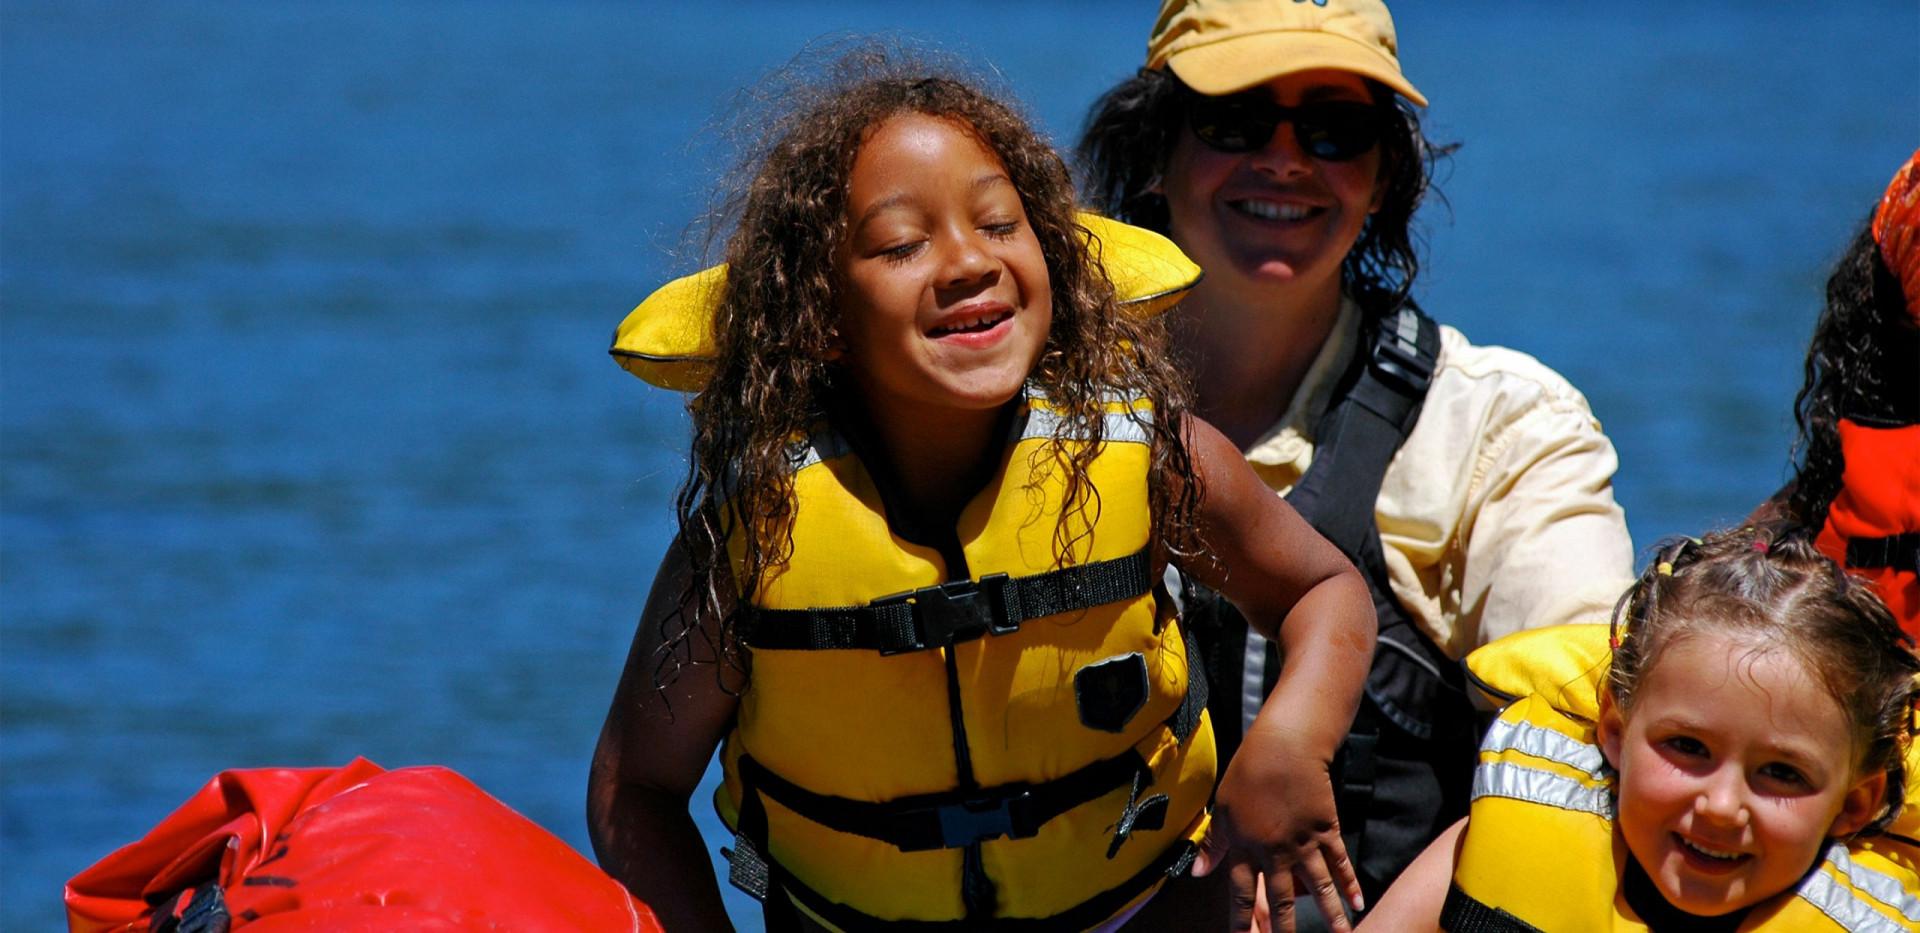 Idaho Salmon - Rafting the River of No Return - Kids